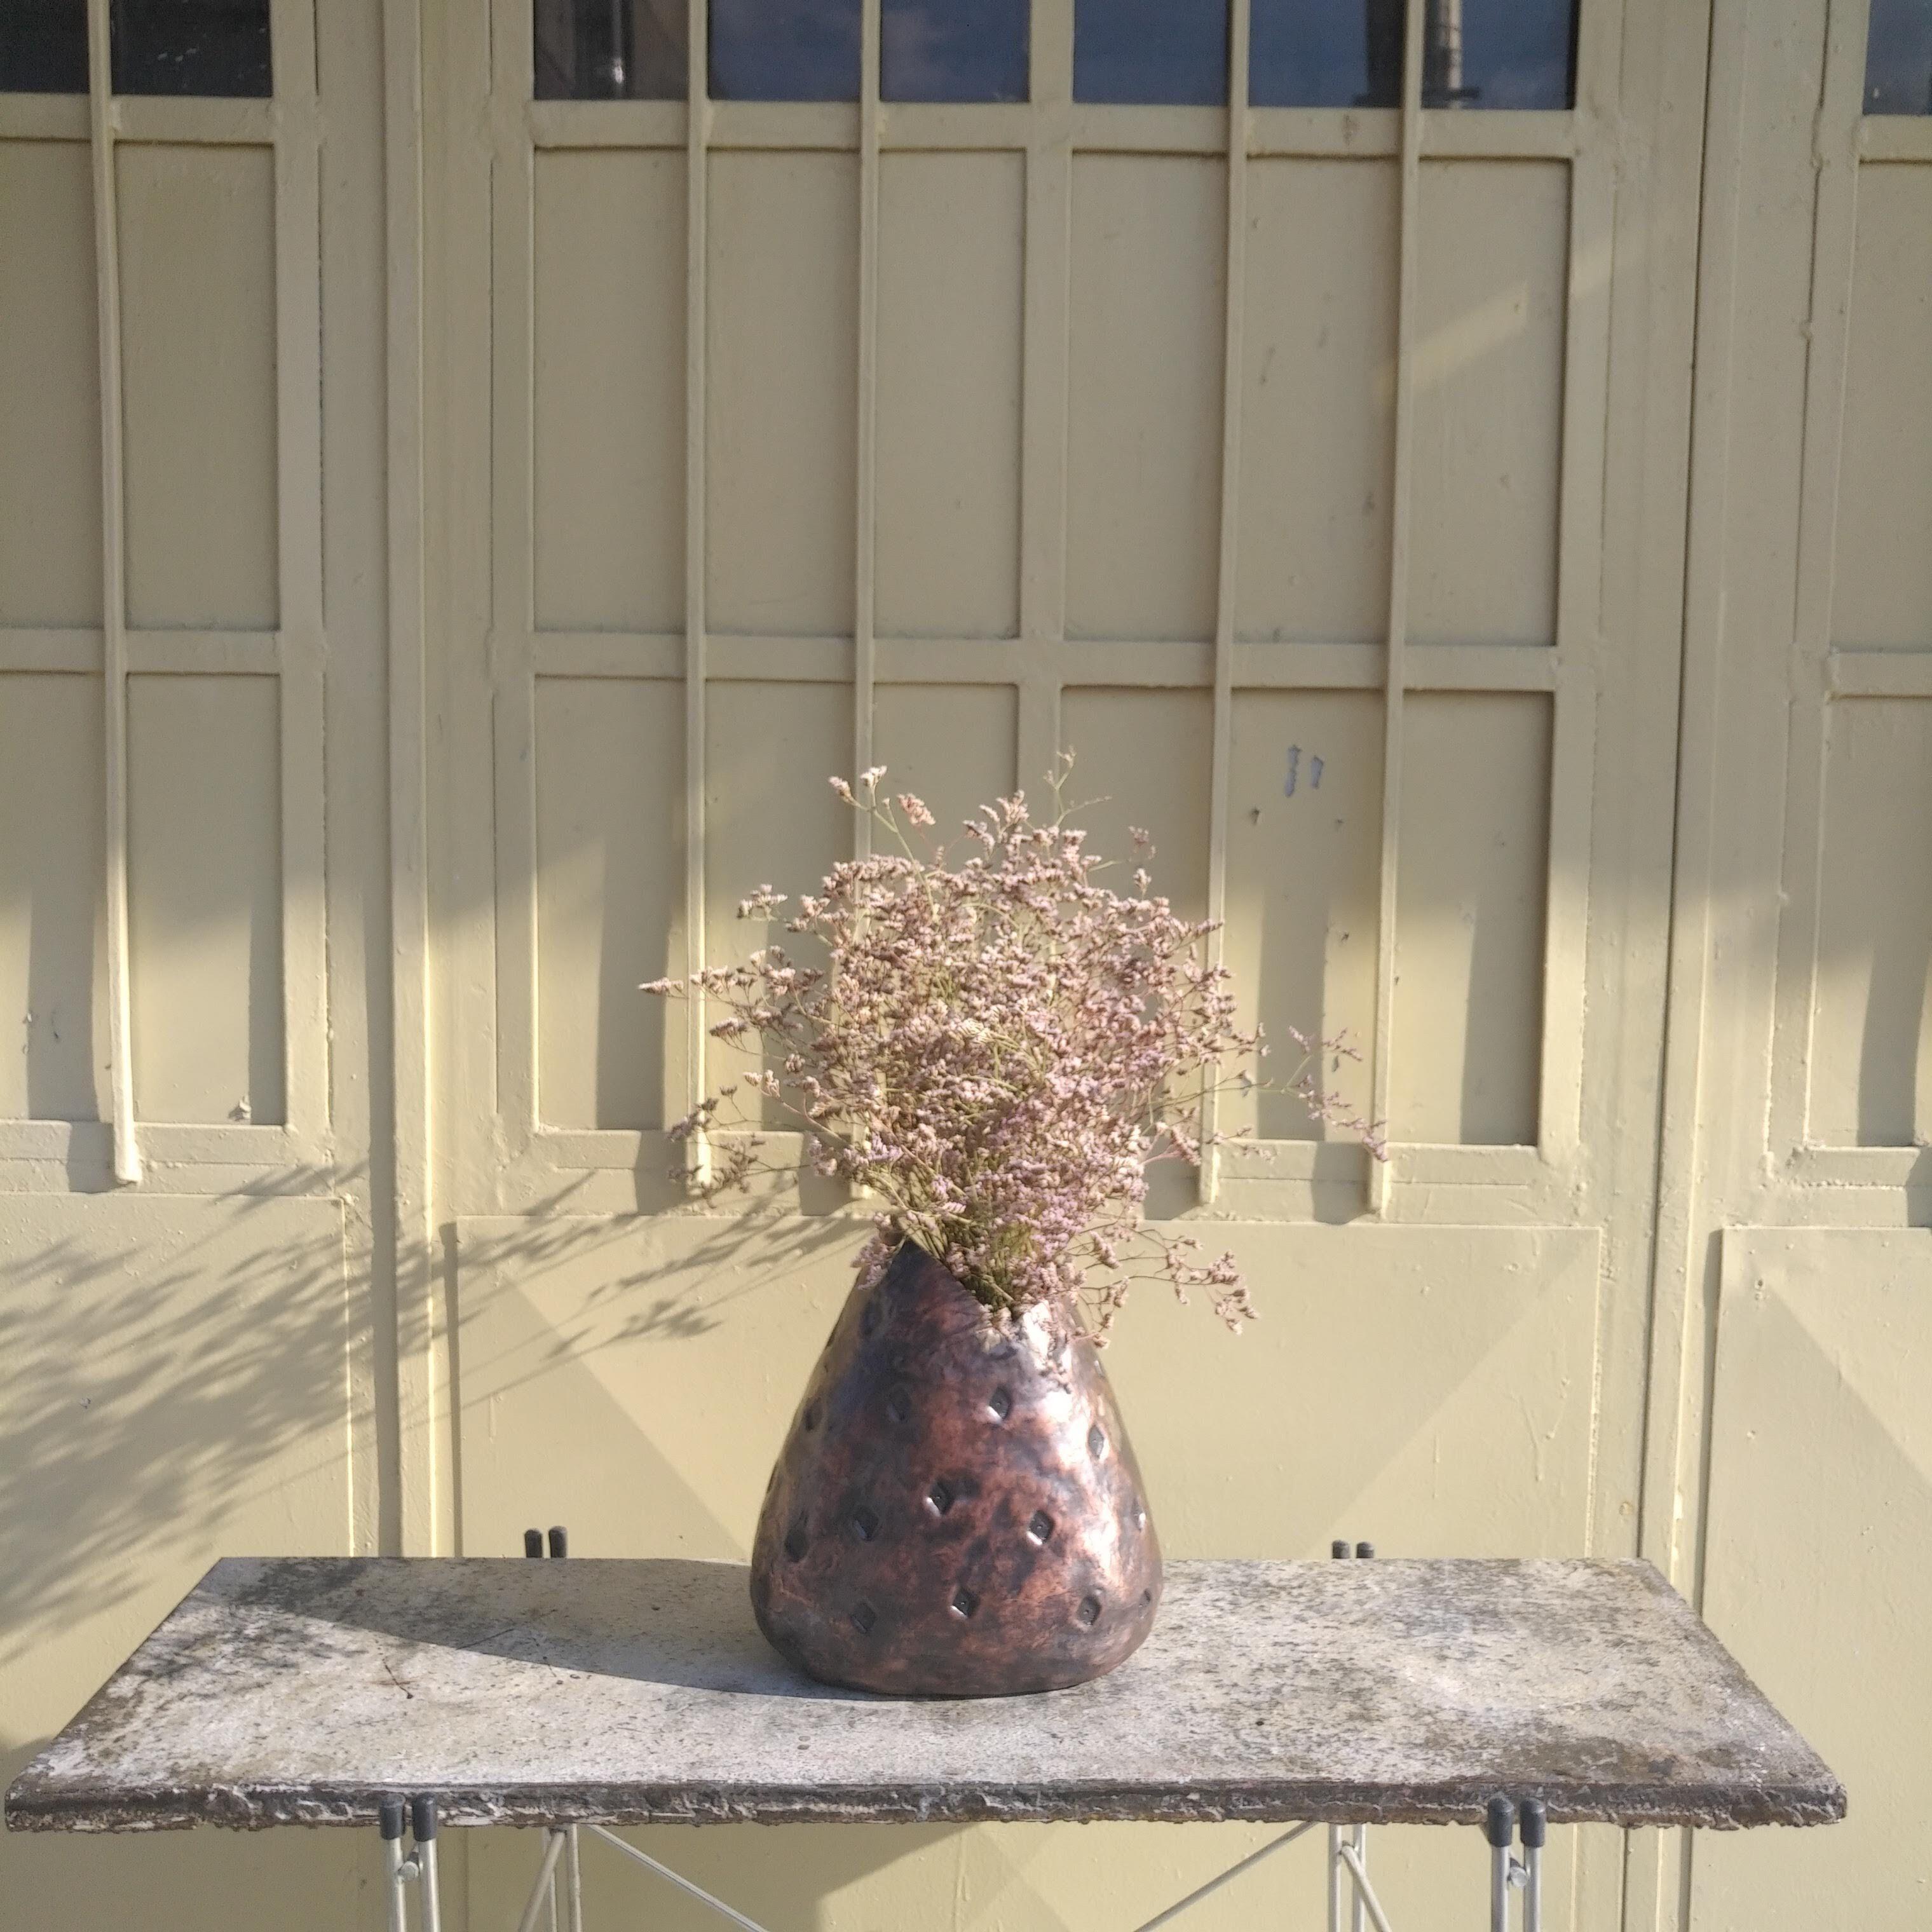 Sac Vase Adorno Design Vase Handcrafted Decor High Table